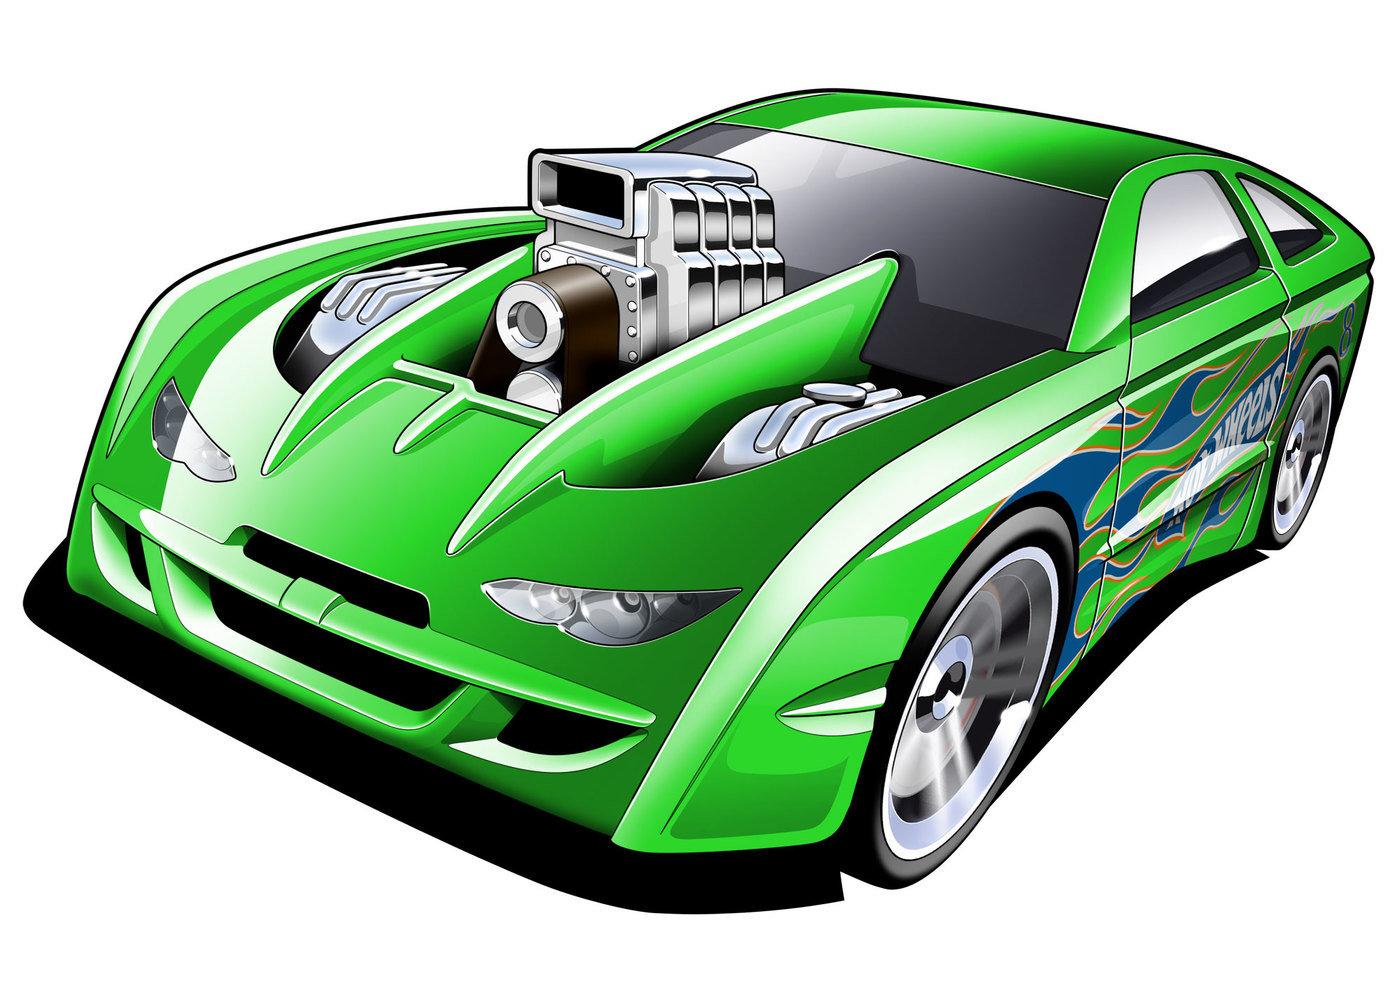 Hot Wheels Illustration By Jamie Seymour At Coroflot.com